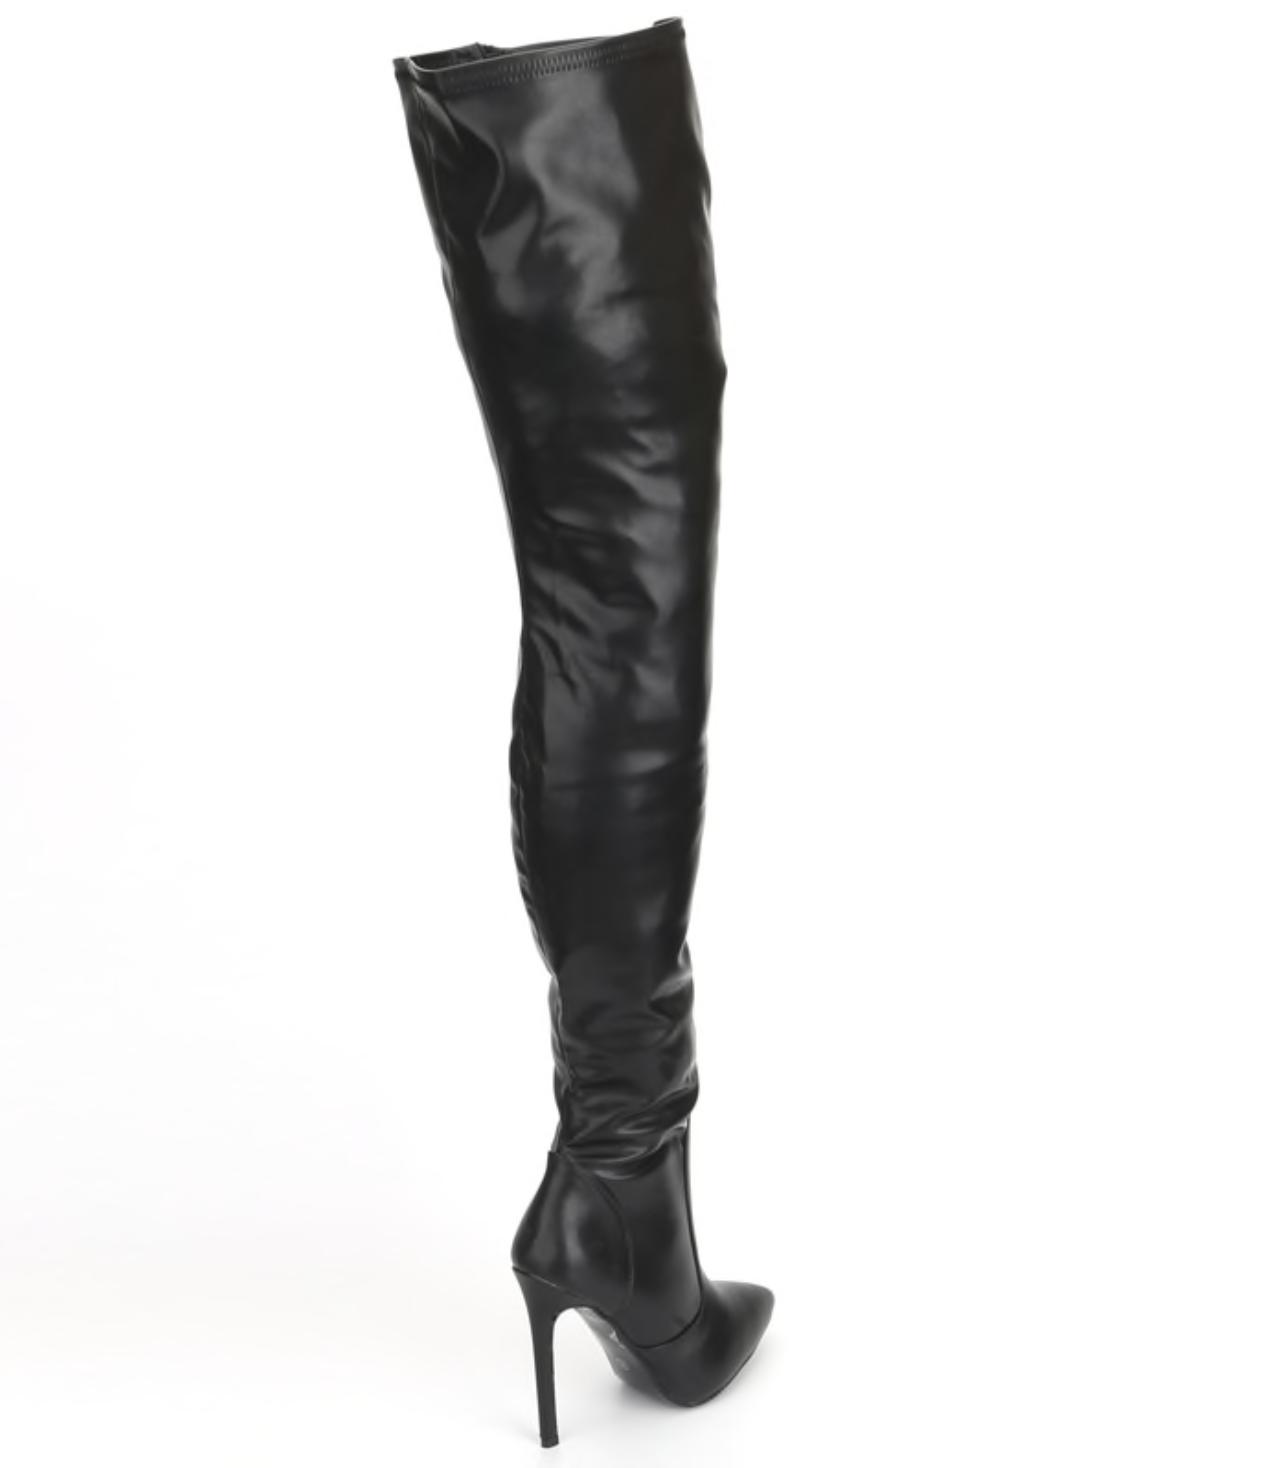 "Extreme thigh high heel stiletto fetish patent 12cm 4.5"" boots UK3-13 3"